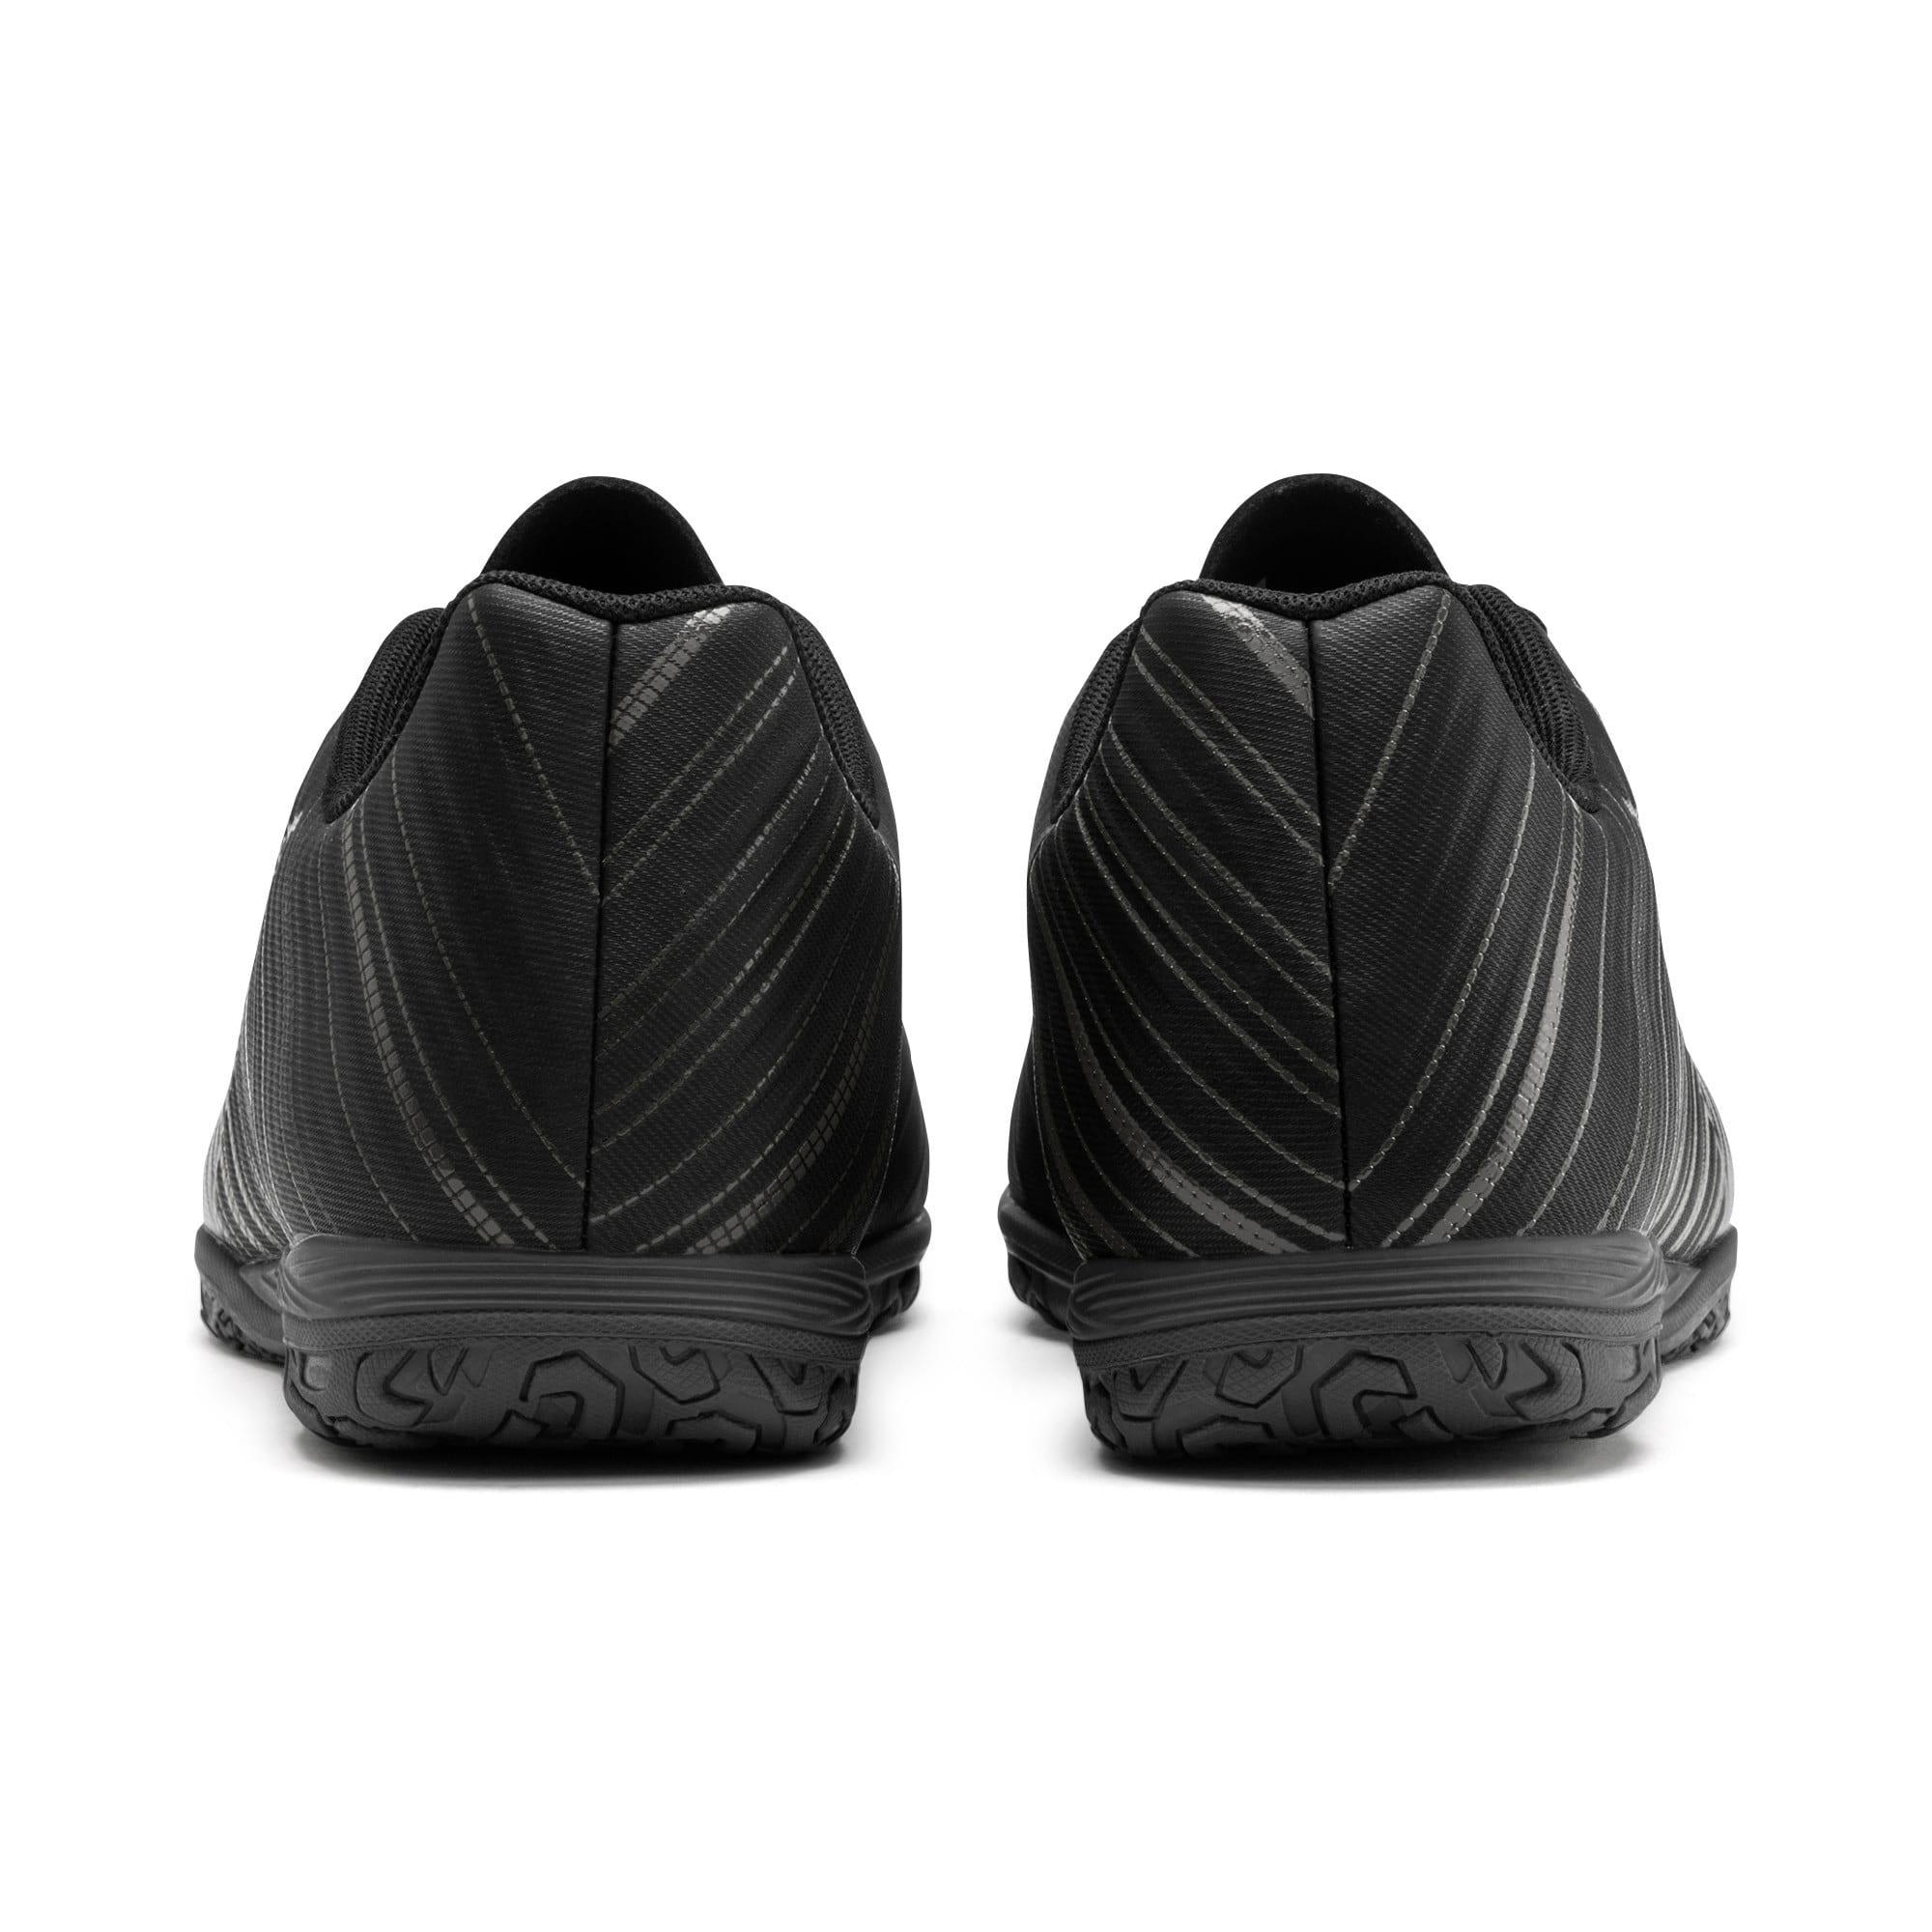 Thumbnail 4 of PUMA ONE 5.4 IT Men's Football Boots, Black-Black-Puma Aged Silver, medium